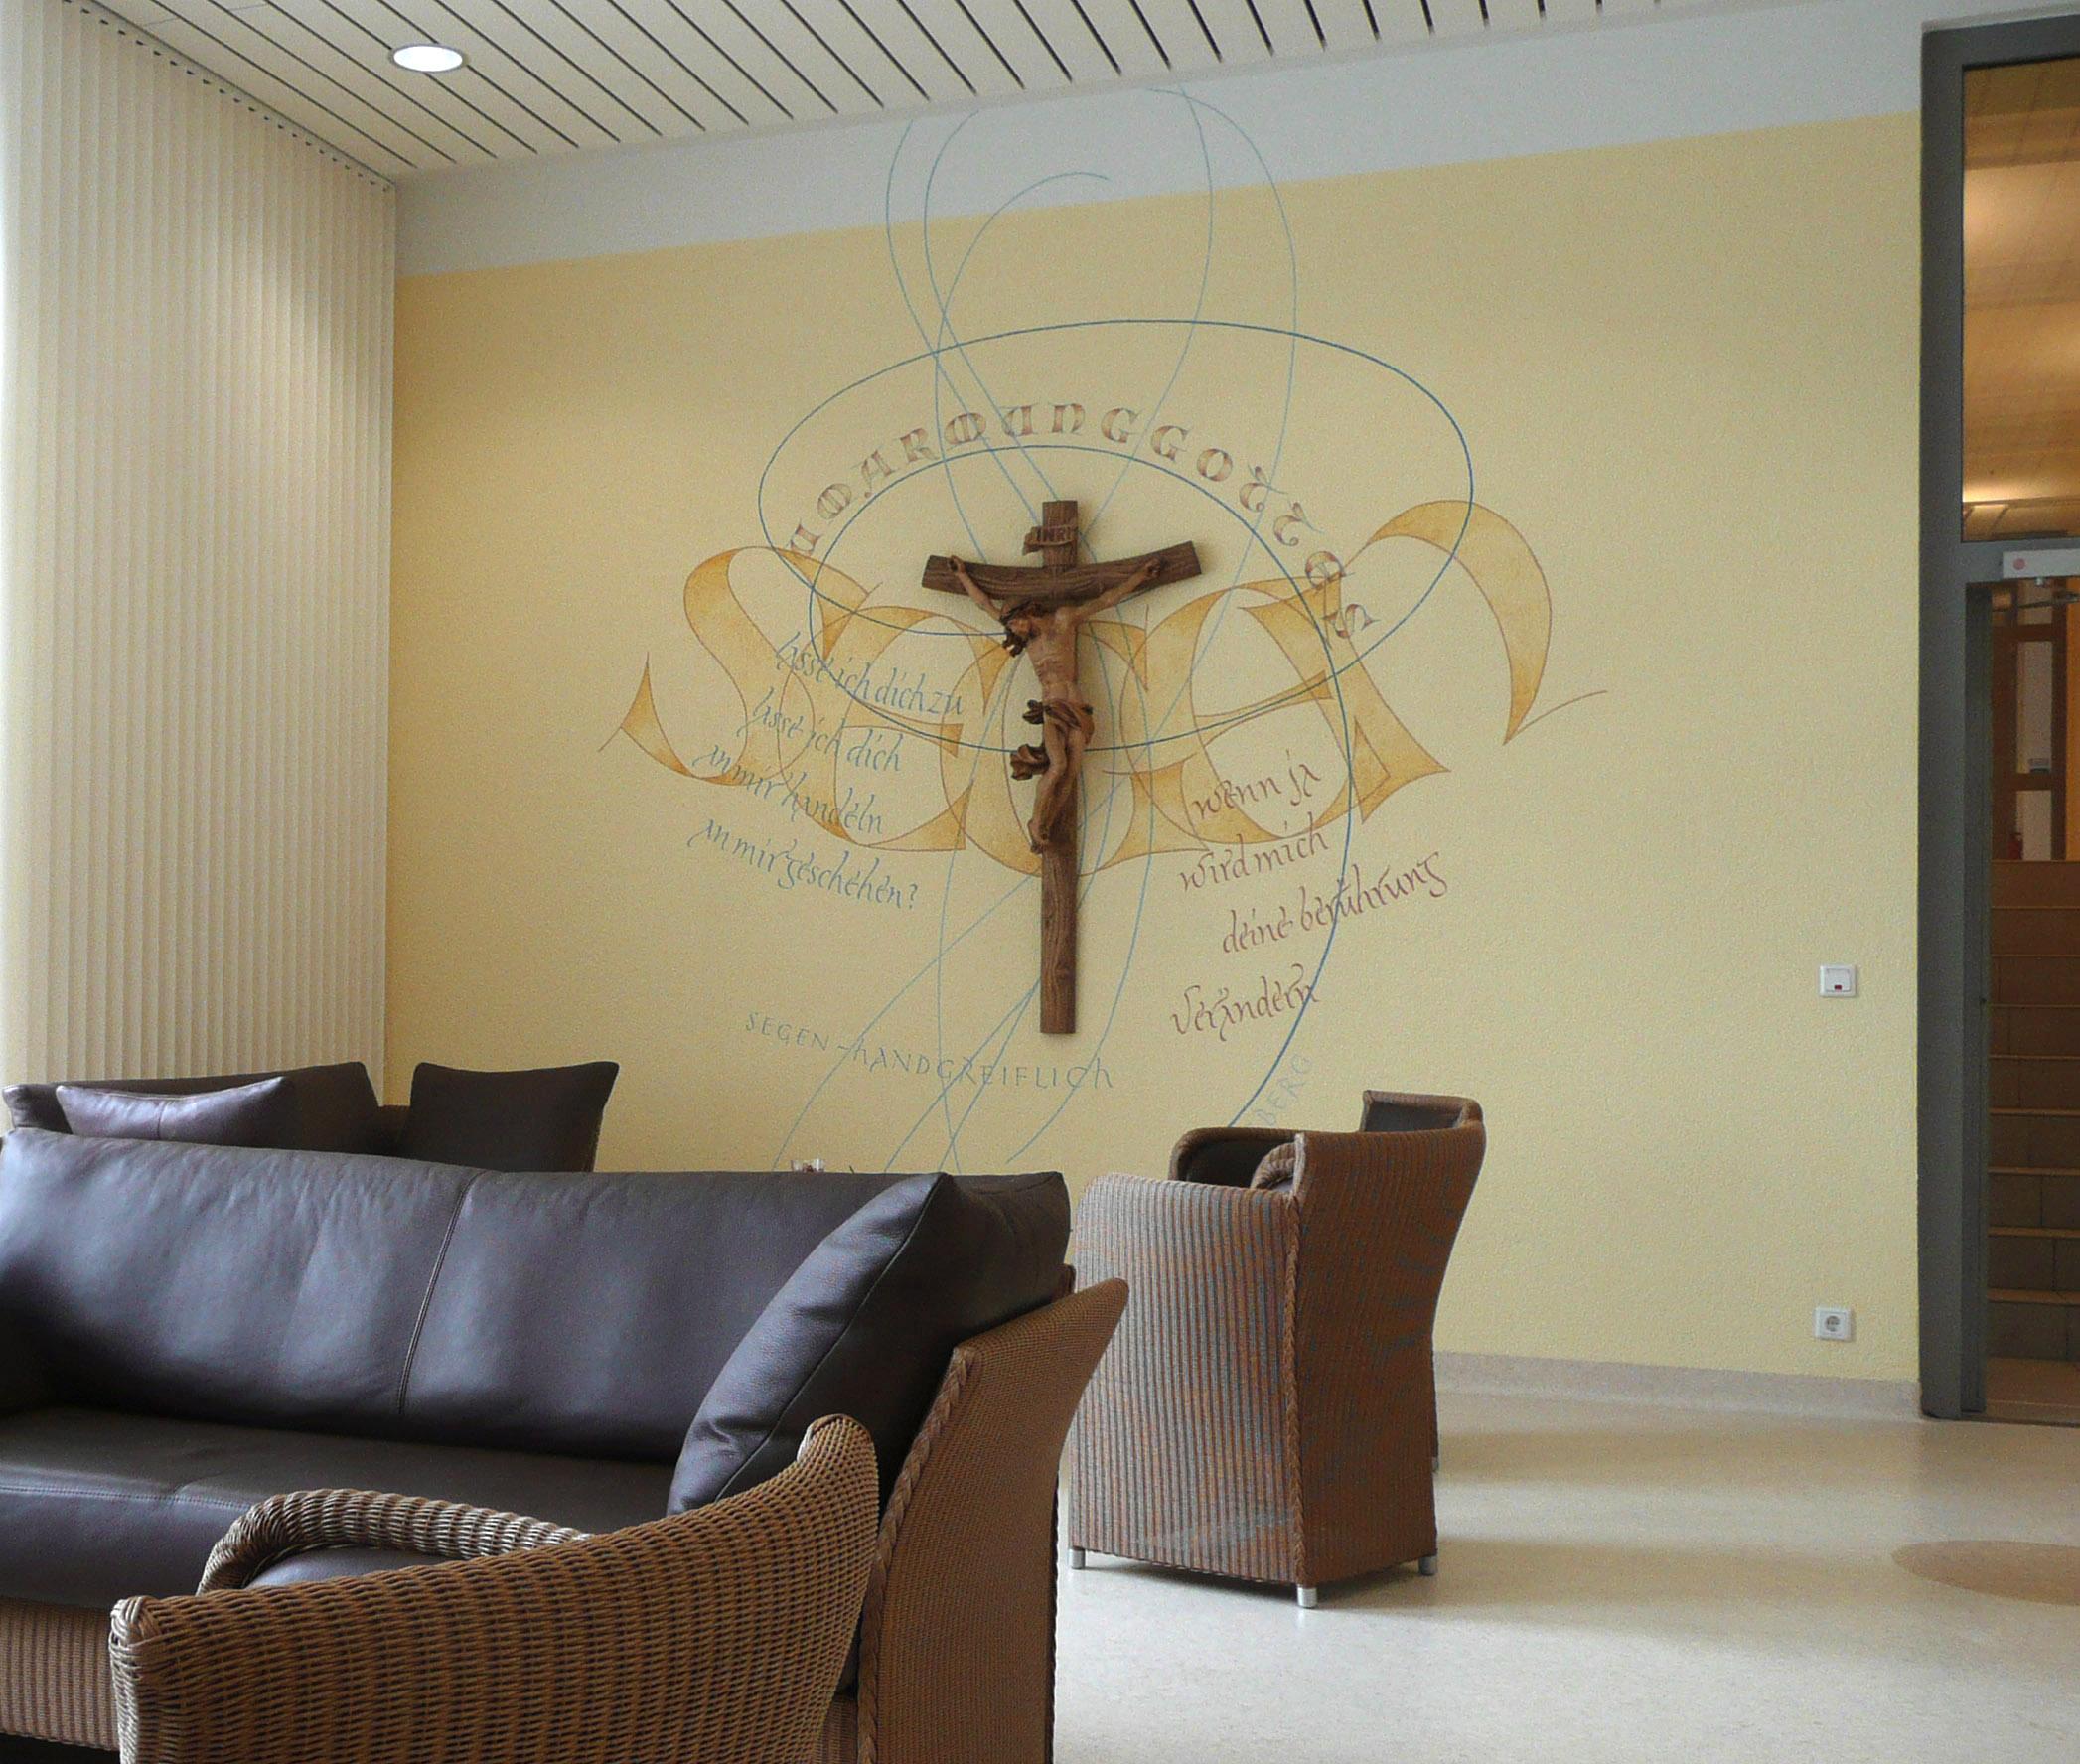 Marienstift Foyer Kalligrafie Wandgestaltung